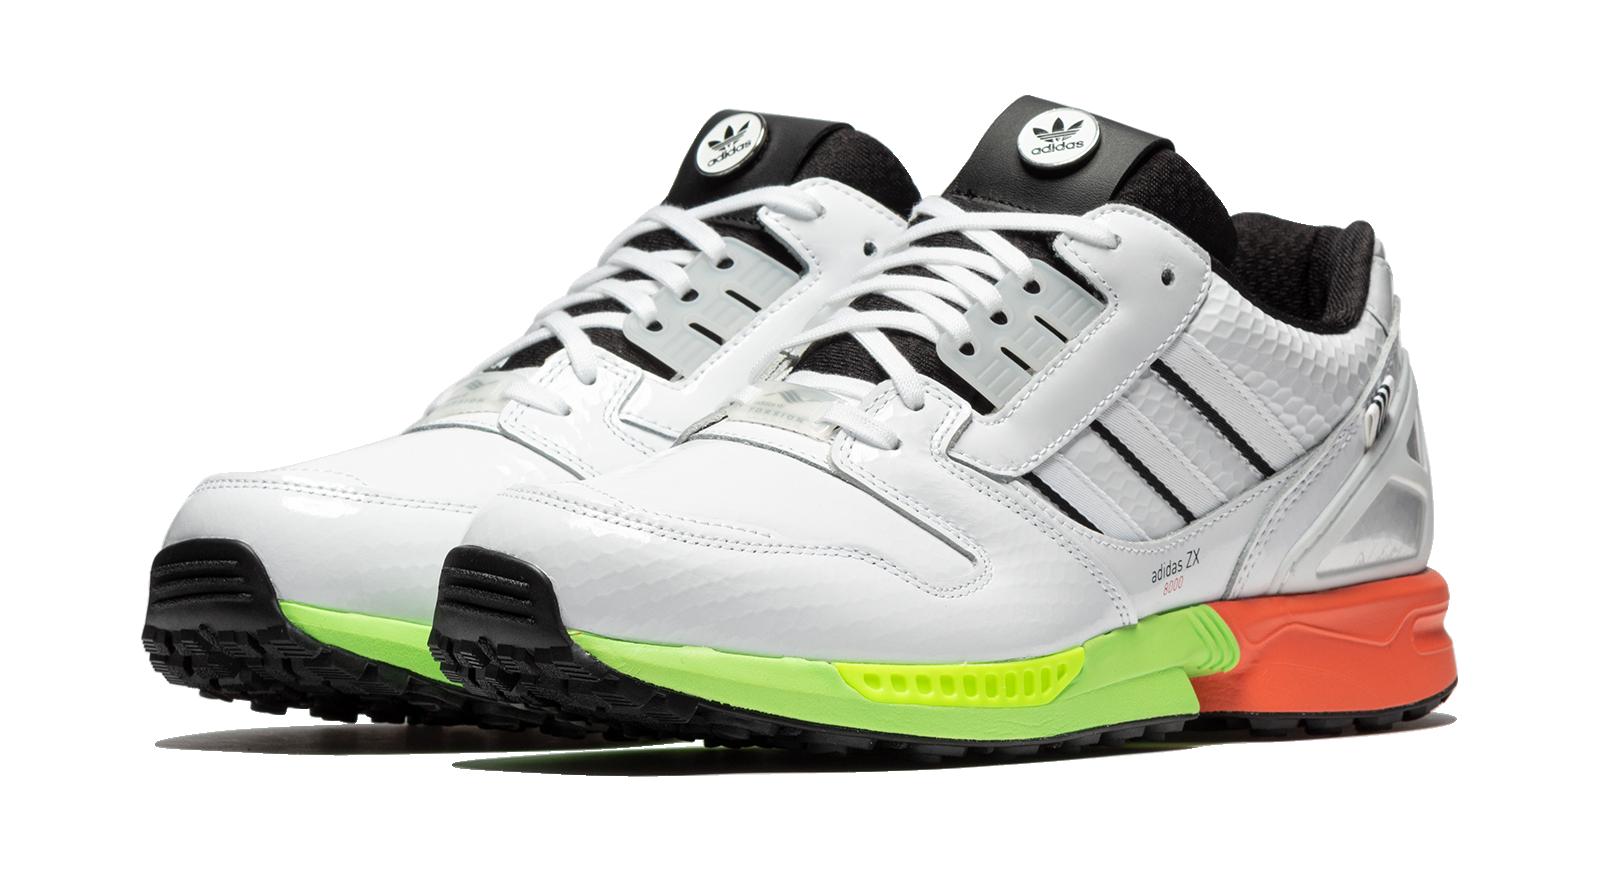 adidas-zx-8000-golf